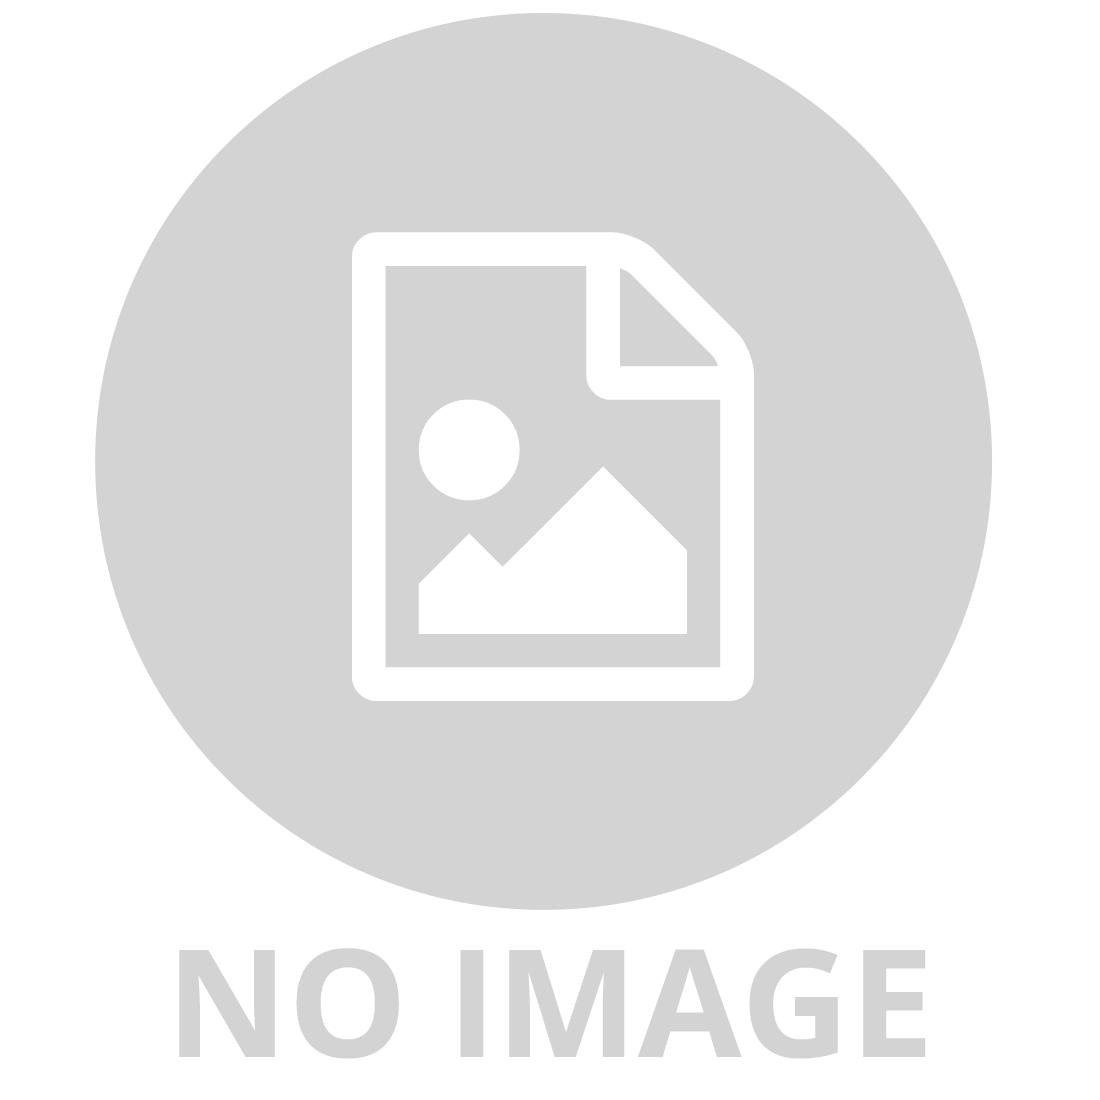 LEGO 7499 FLEXIBLE TRACKS